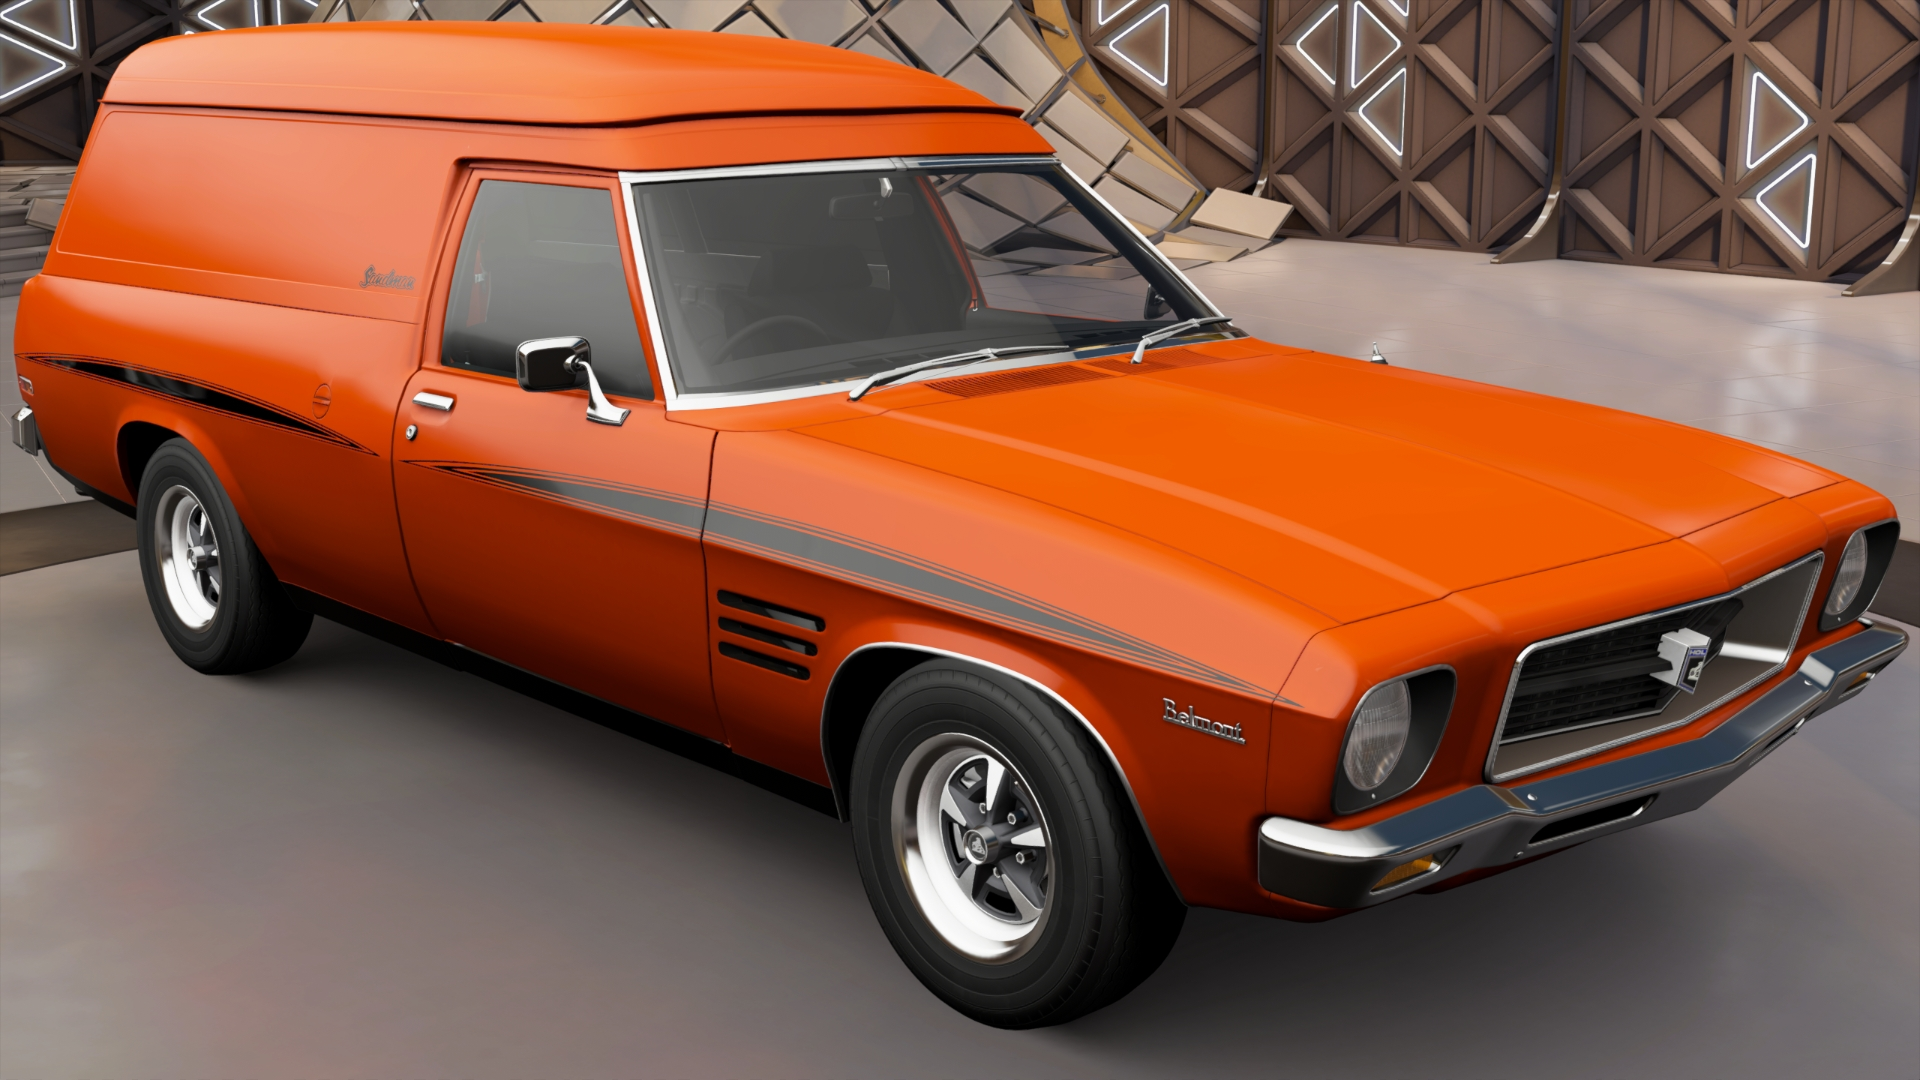 Holden Sandman HQ Panelvan | Forza Motorsport Wiki | FANDOM